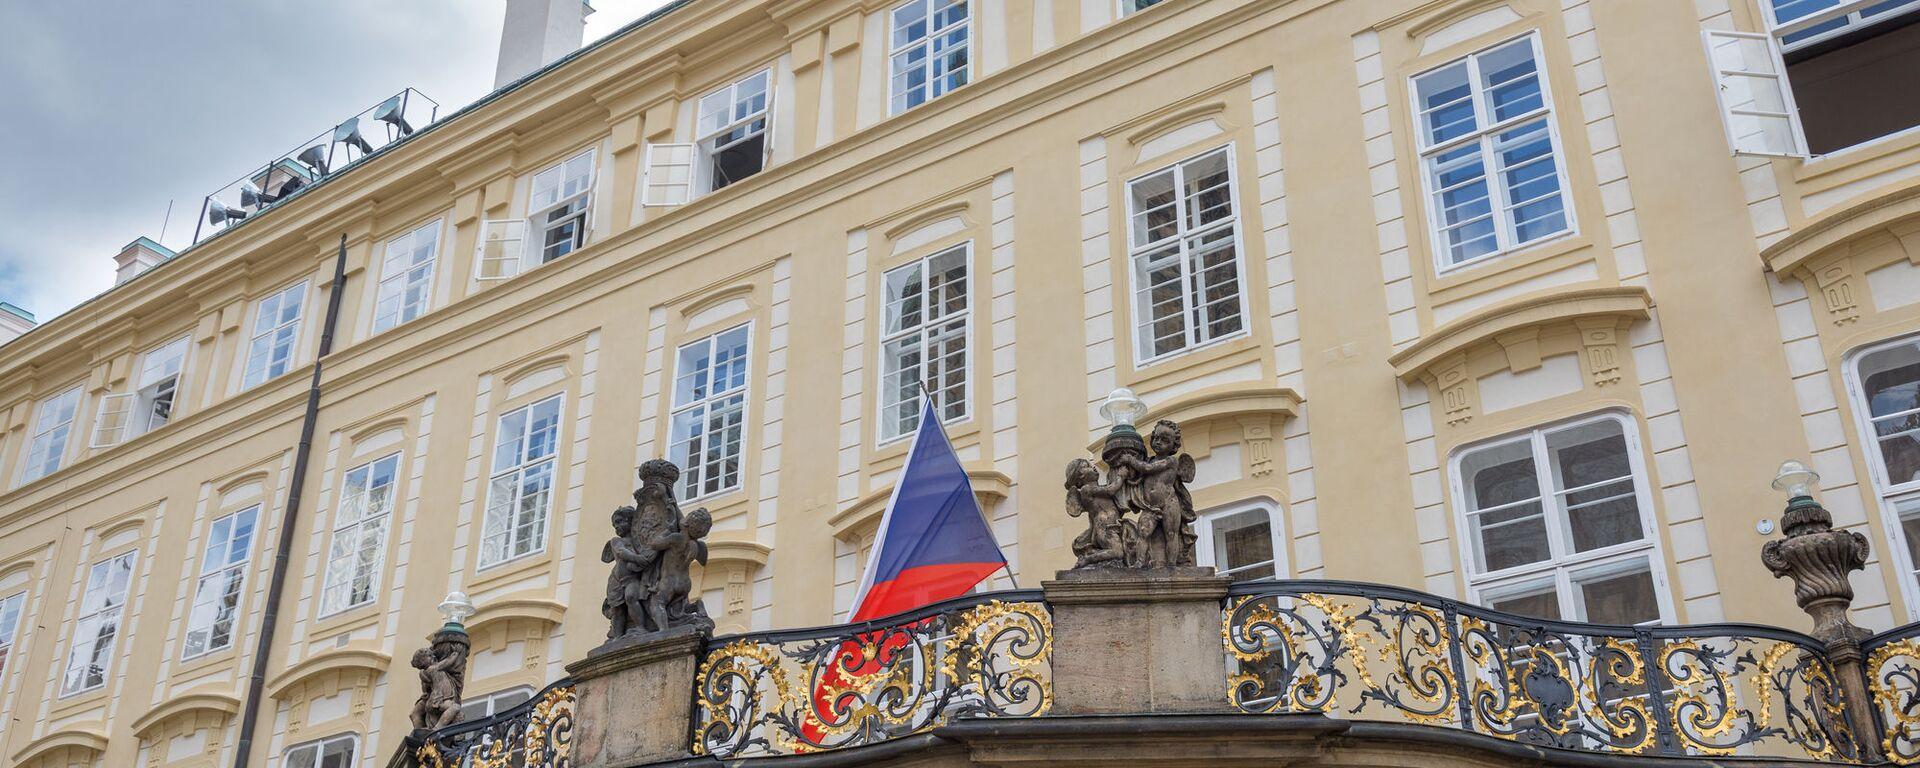 Pražský hrad - Sputnik Česká republika, 1920, 16.07.2021